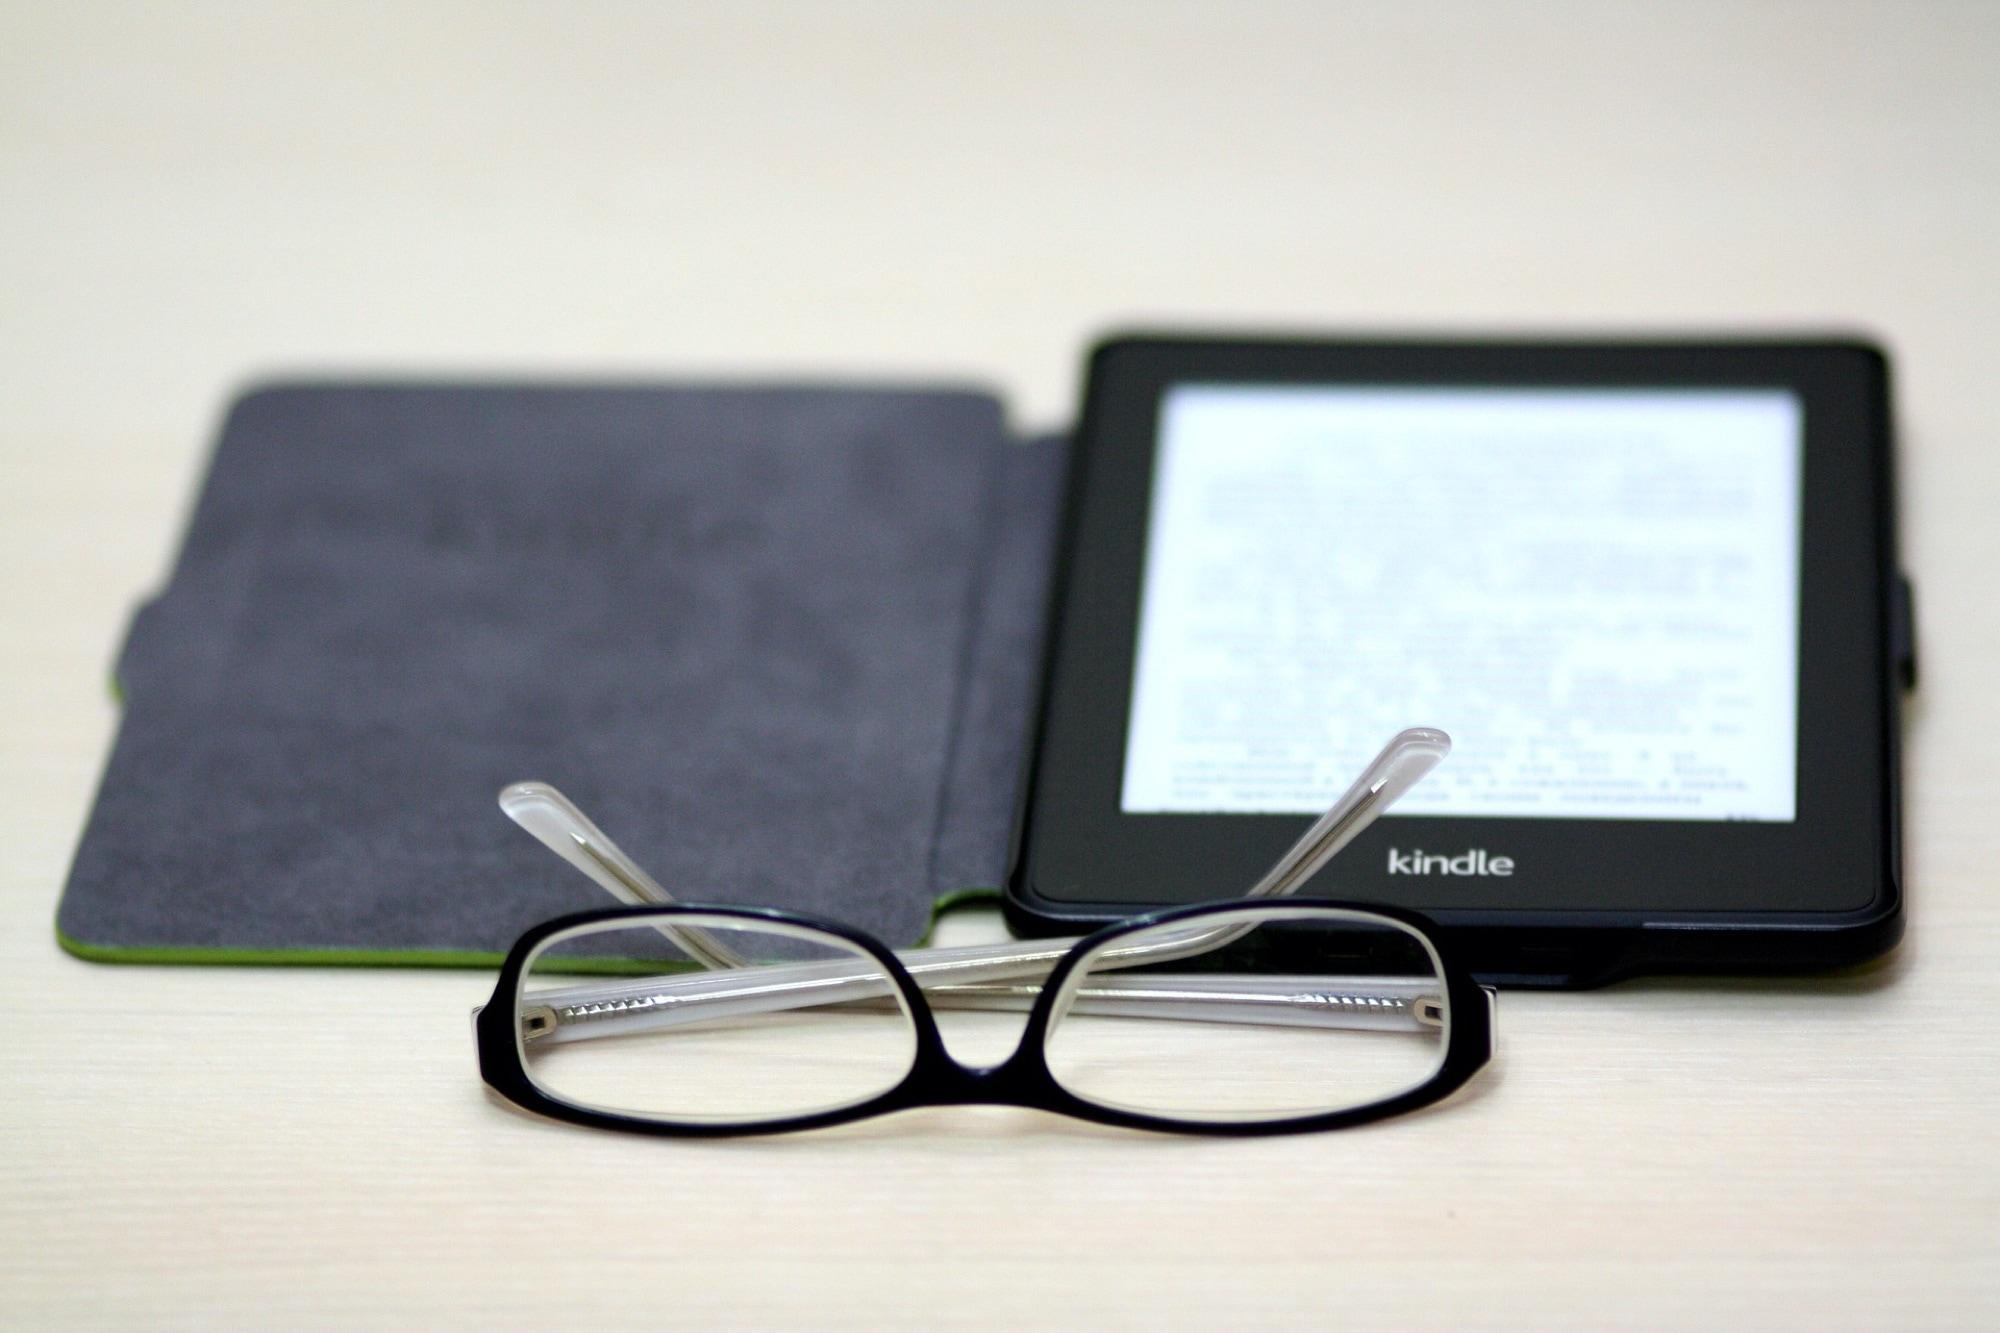 Amazon Kindle with Reading Glasses